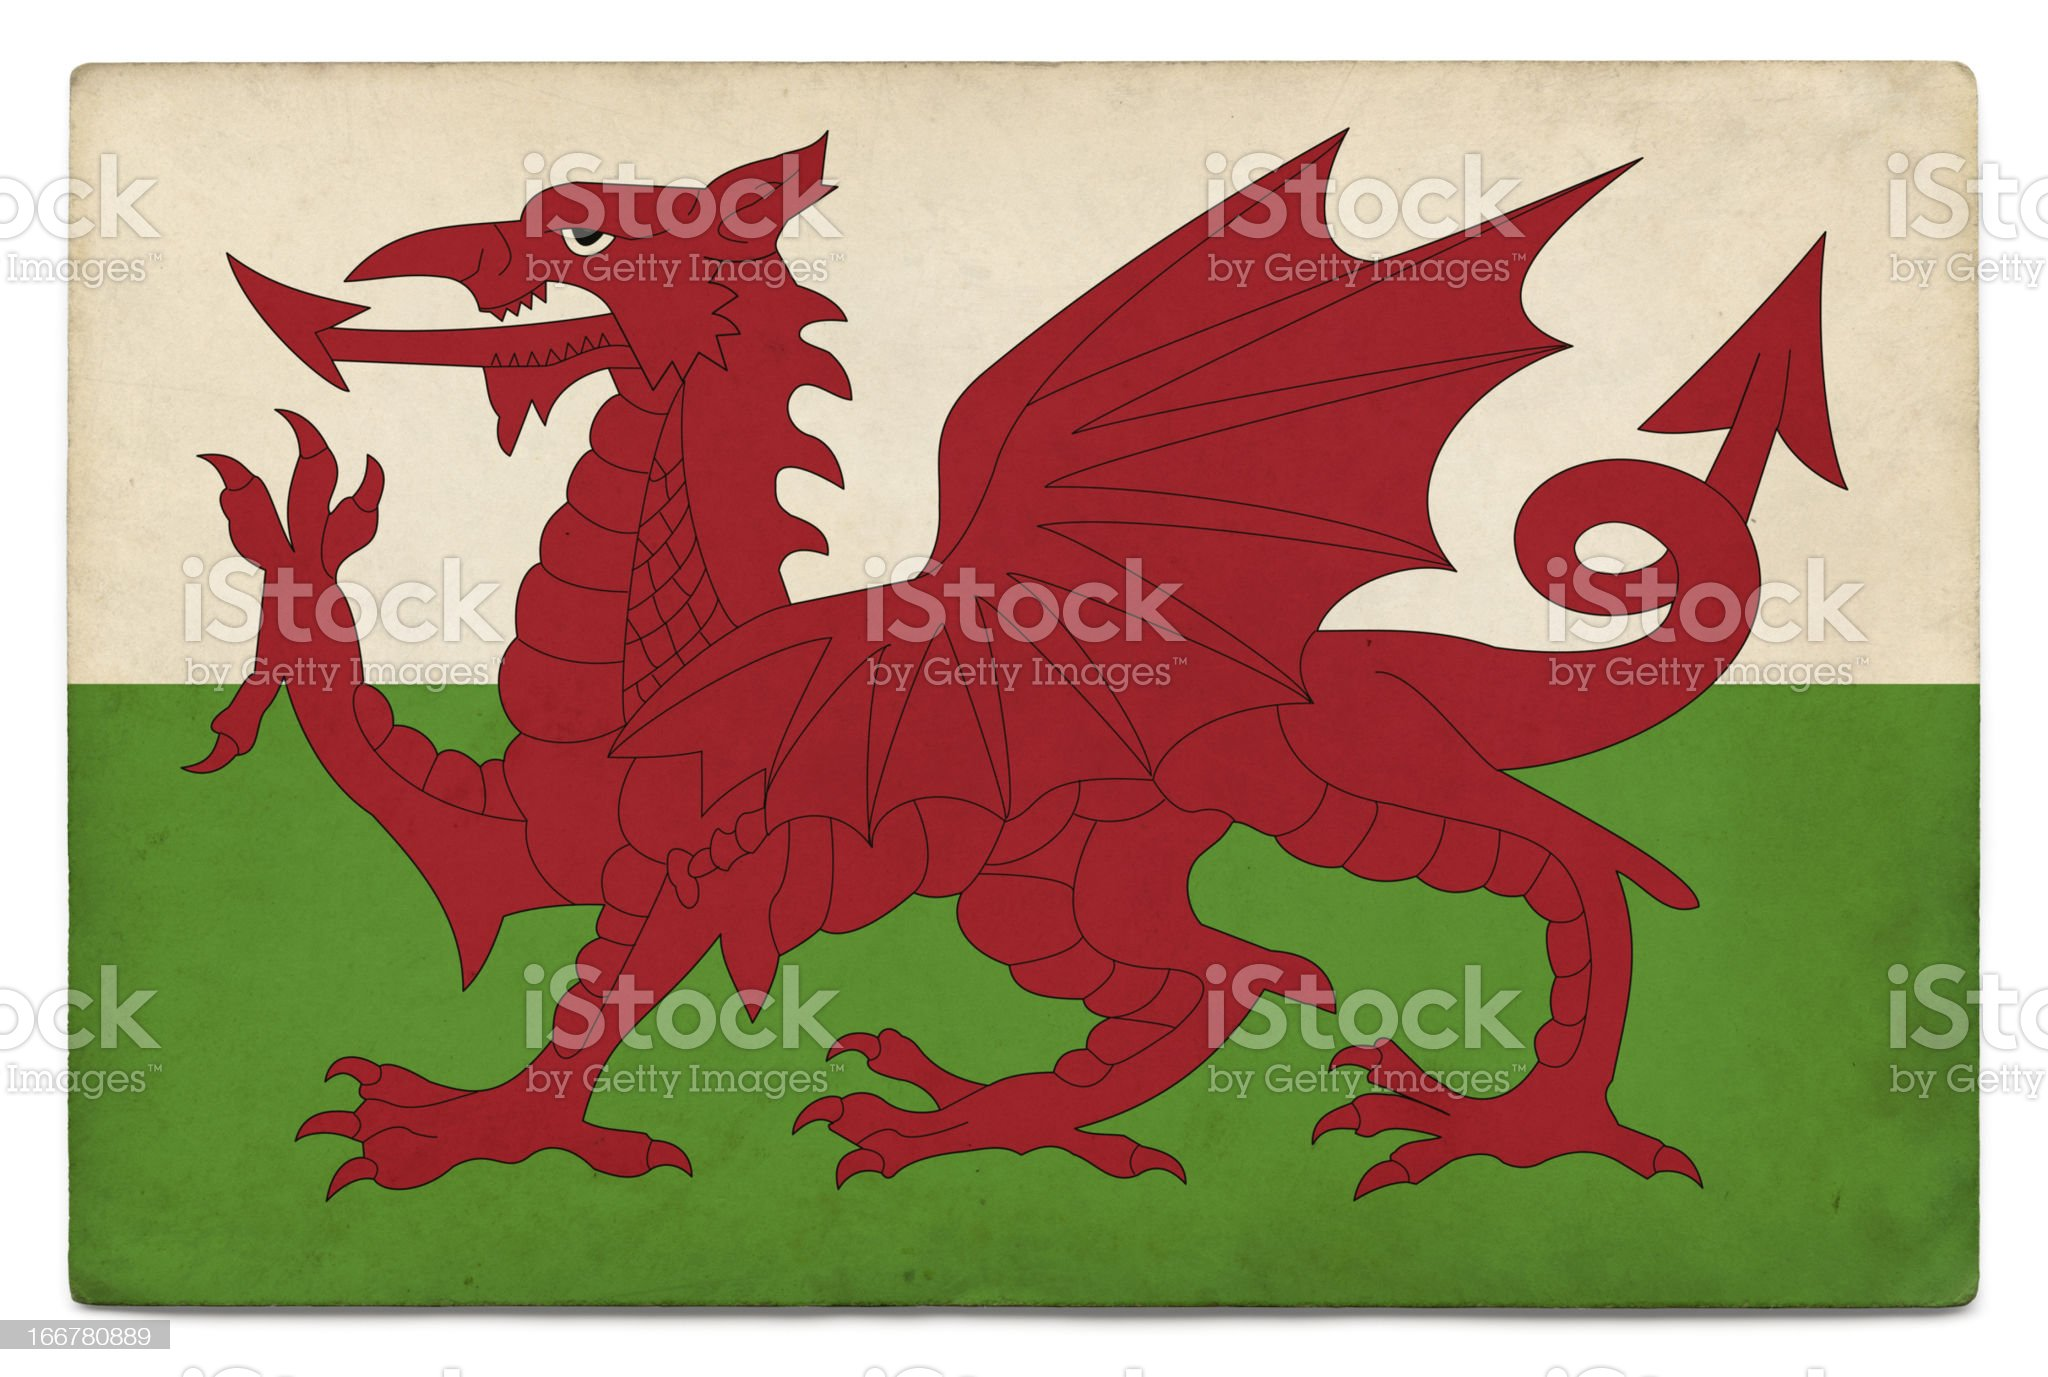 Grunge flag of Wales on white royalty-free stock photo